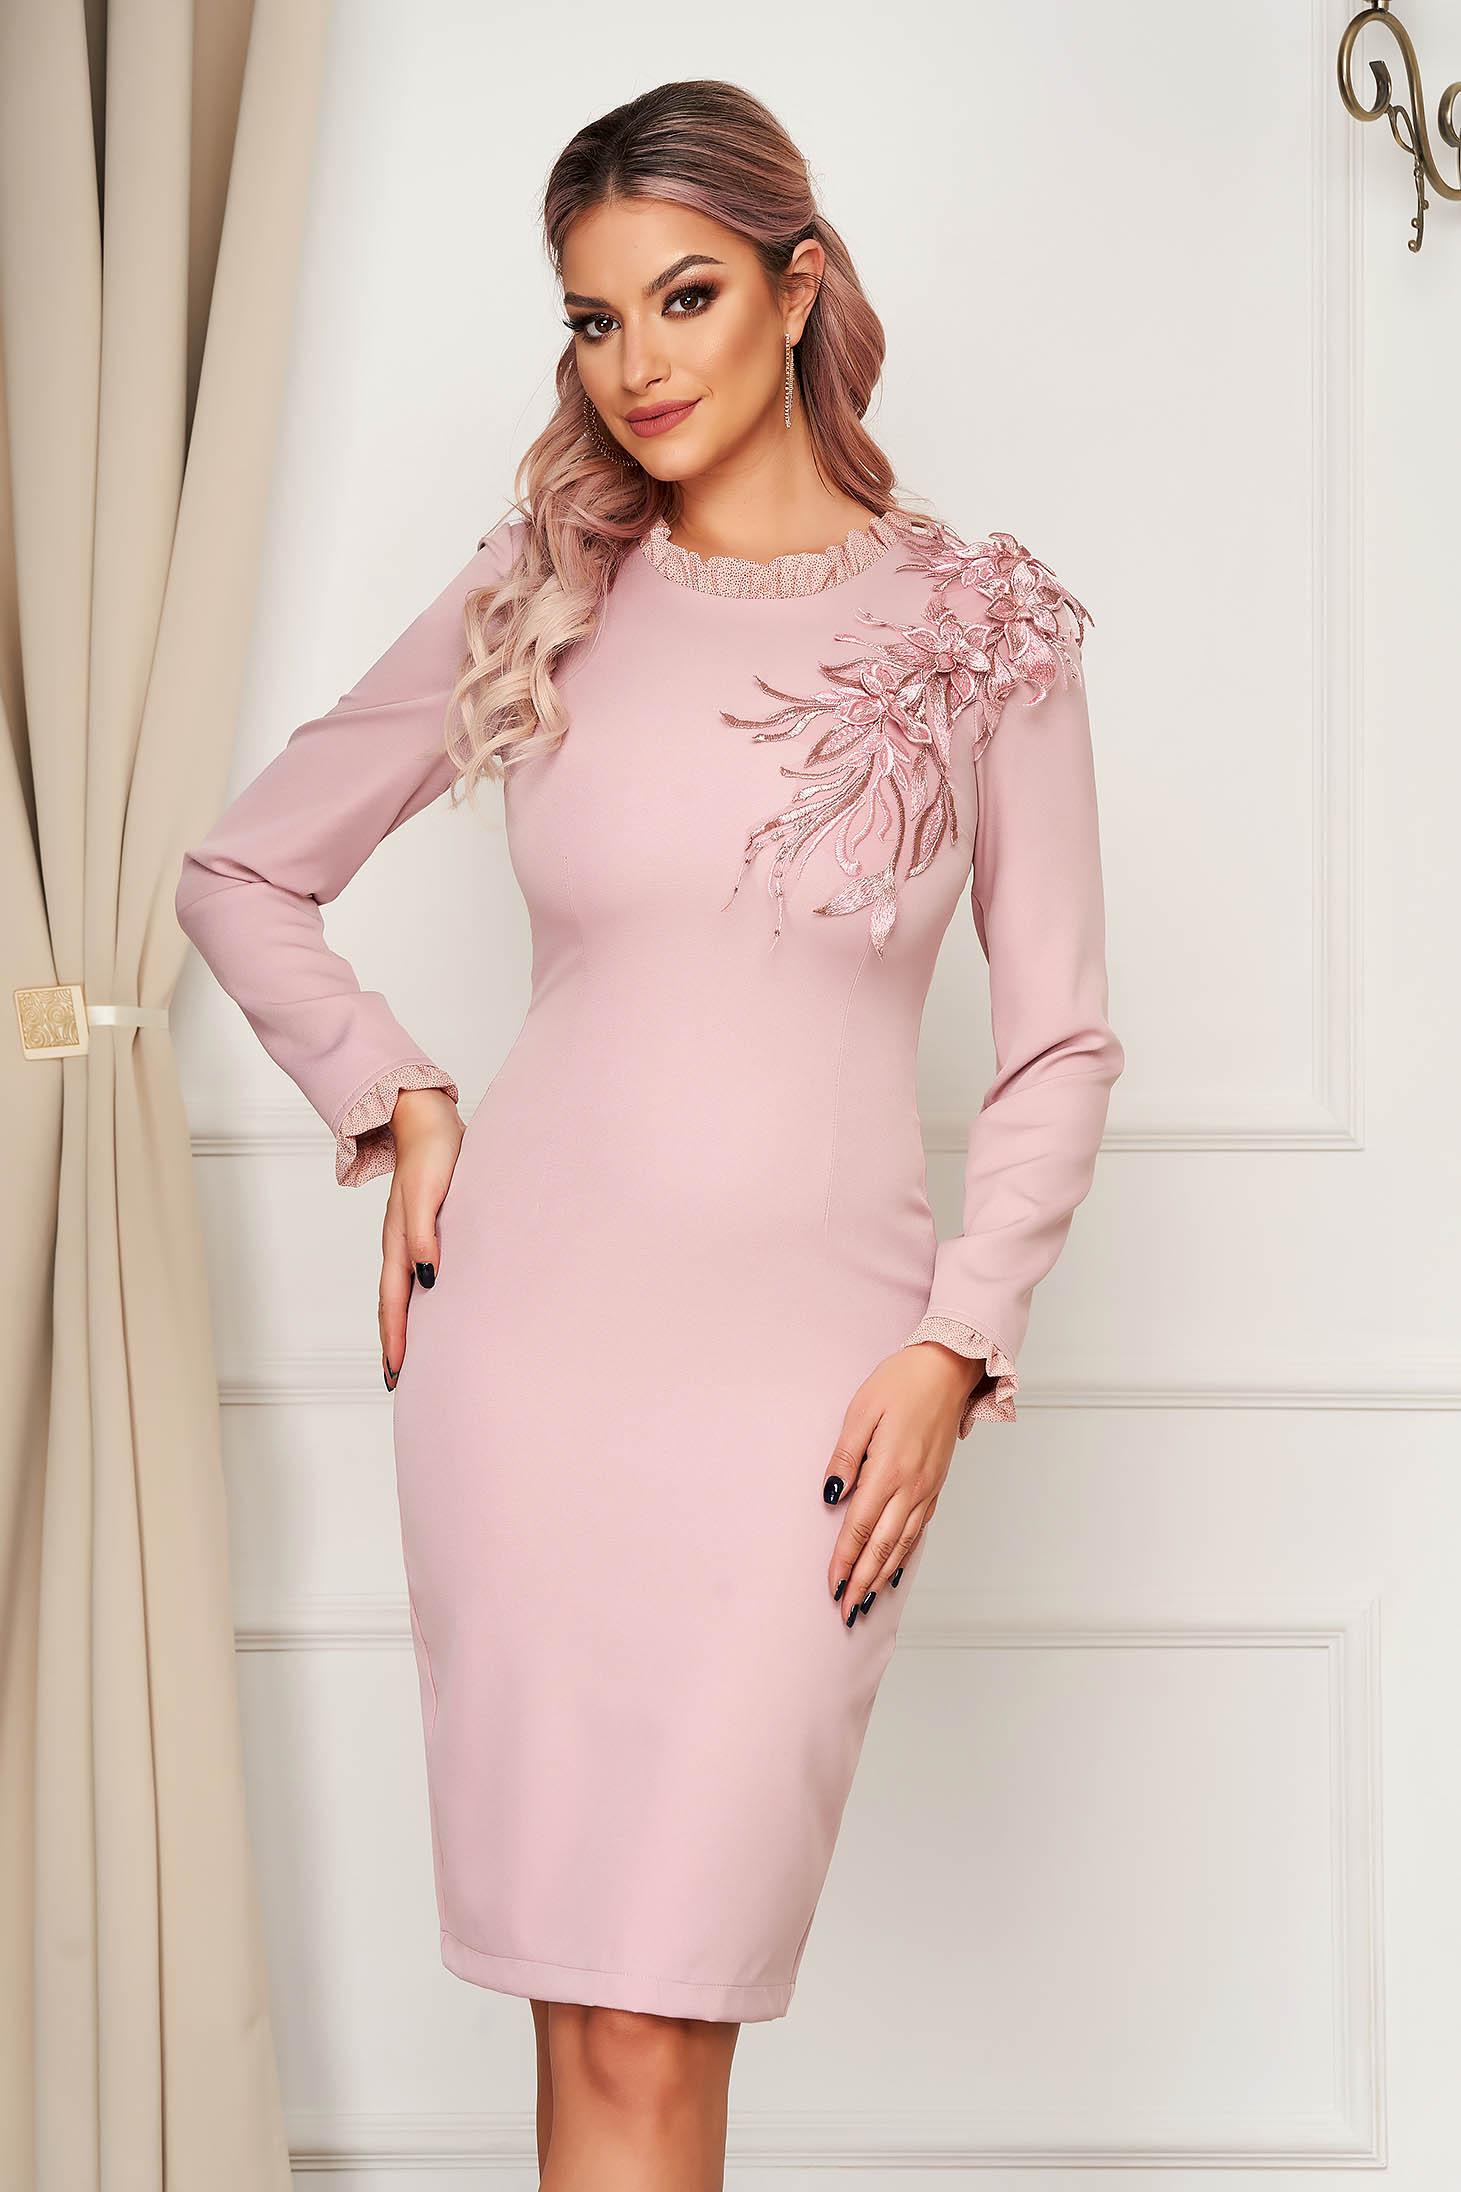 Rochie StarShinerS roz prafuit eleganta midi din stofa elastica cu sclipici si flori cu efect 3d